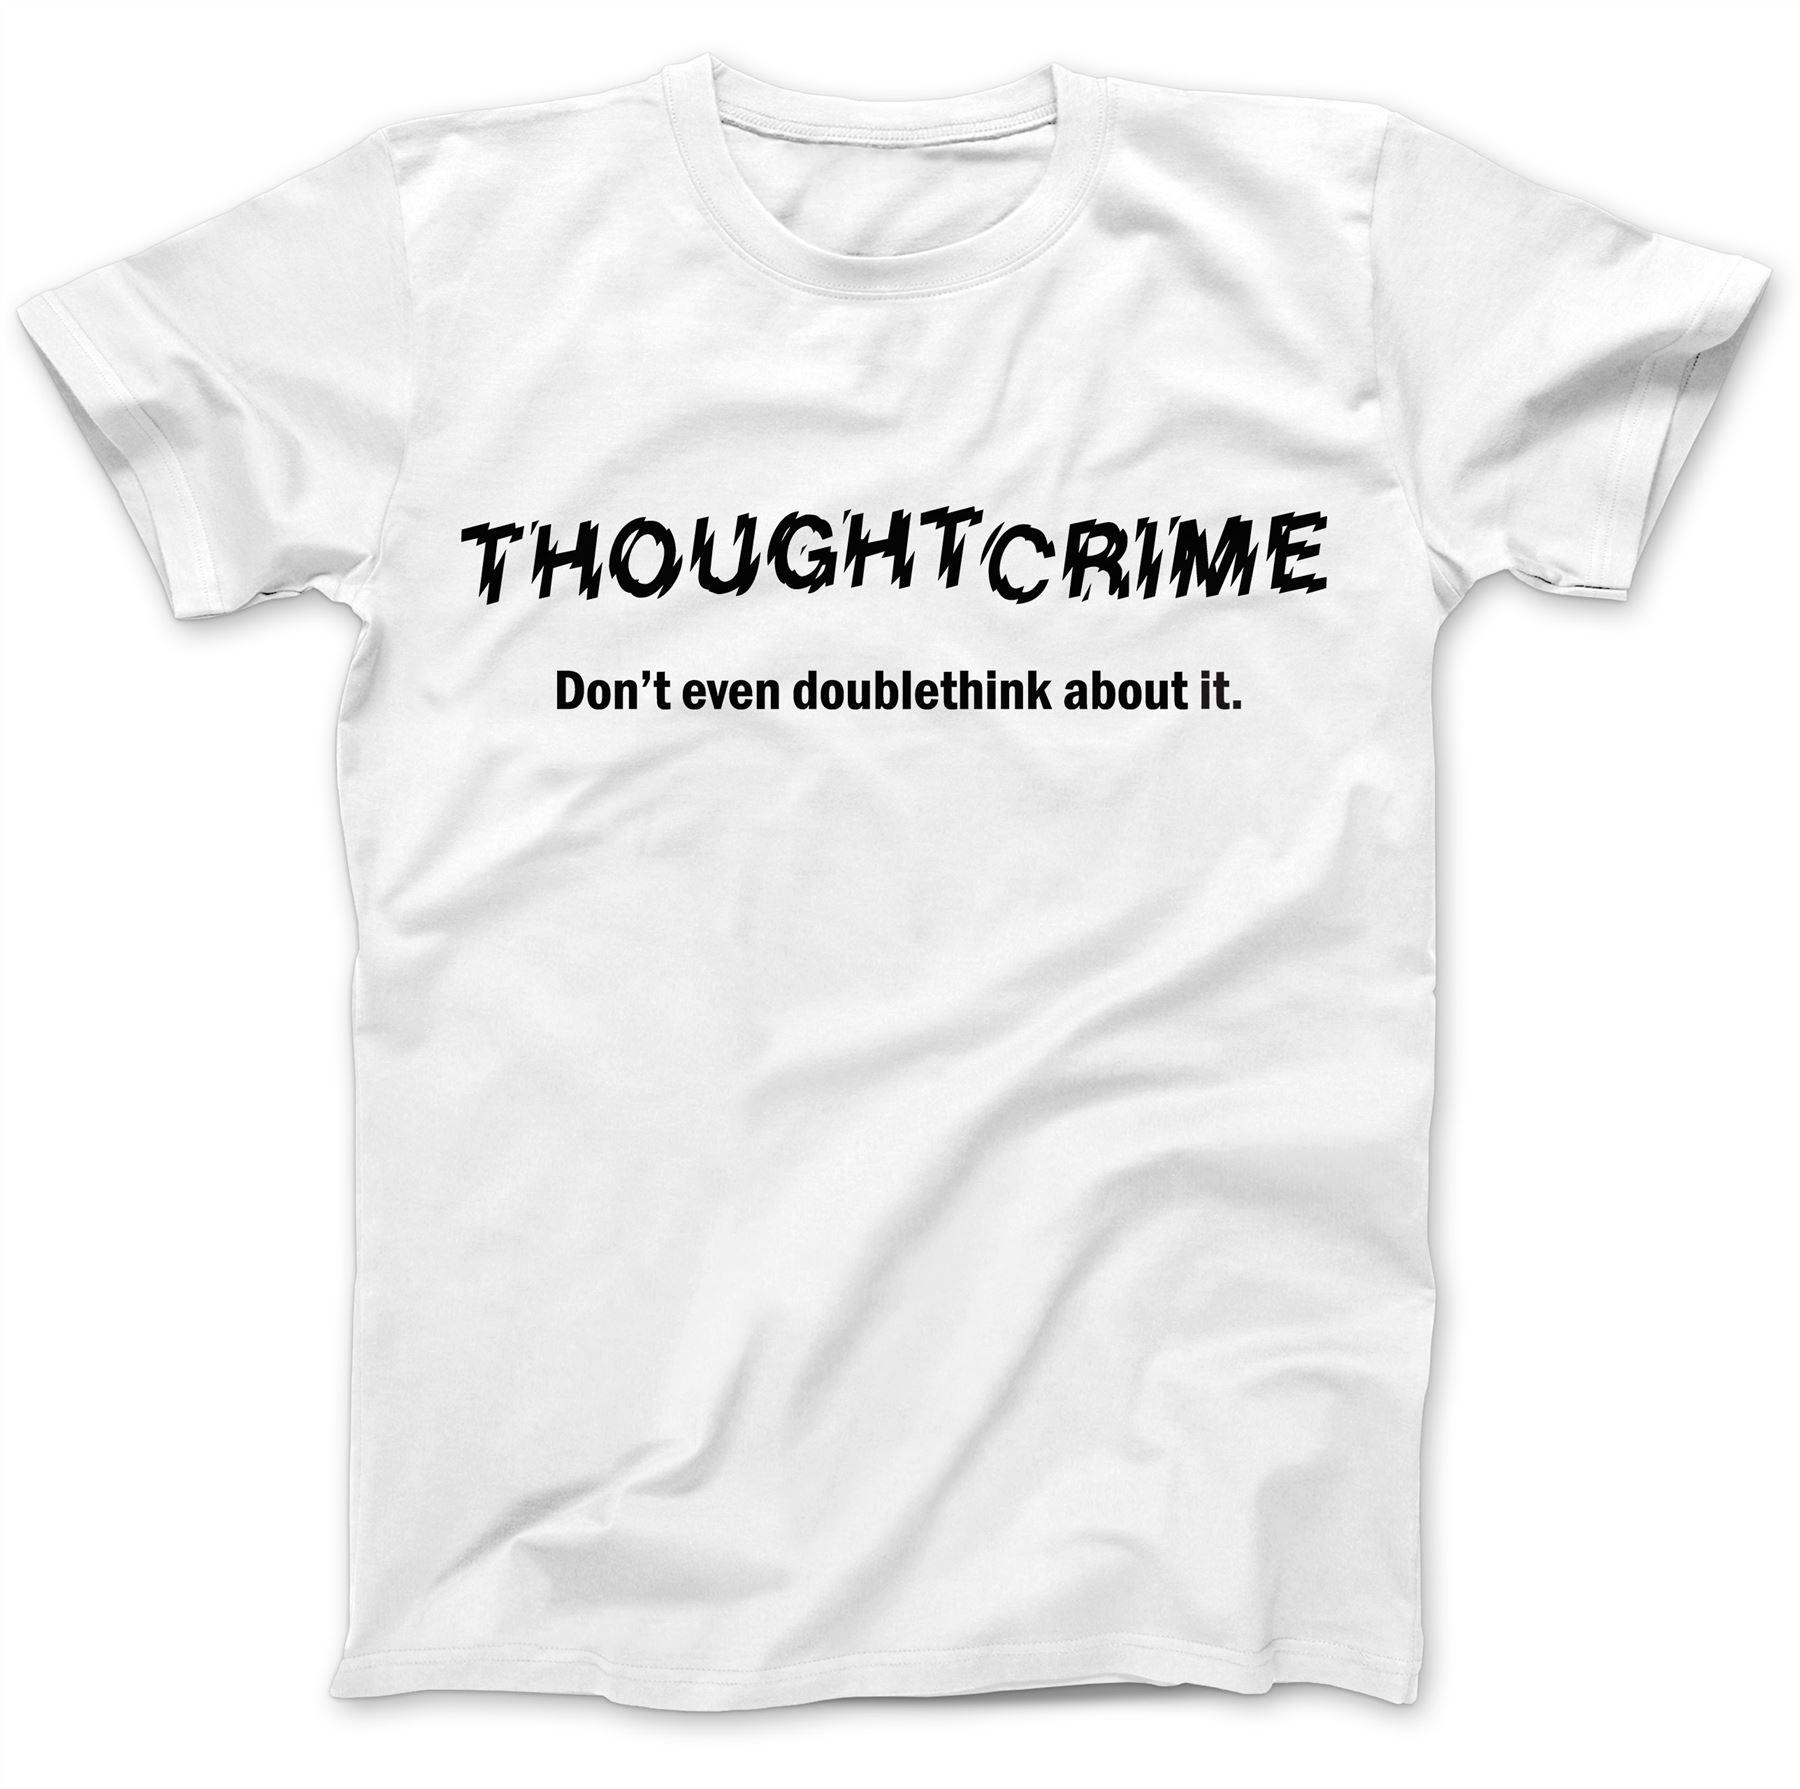 1984-Thought-Crime-George-Orwell-T-Shirt-100-Premium-Cotton-Animal-Farm miniatuur 25